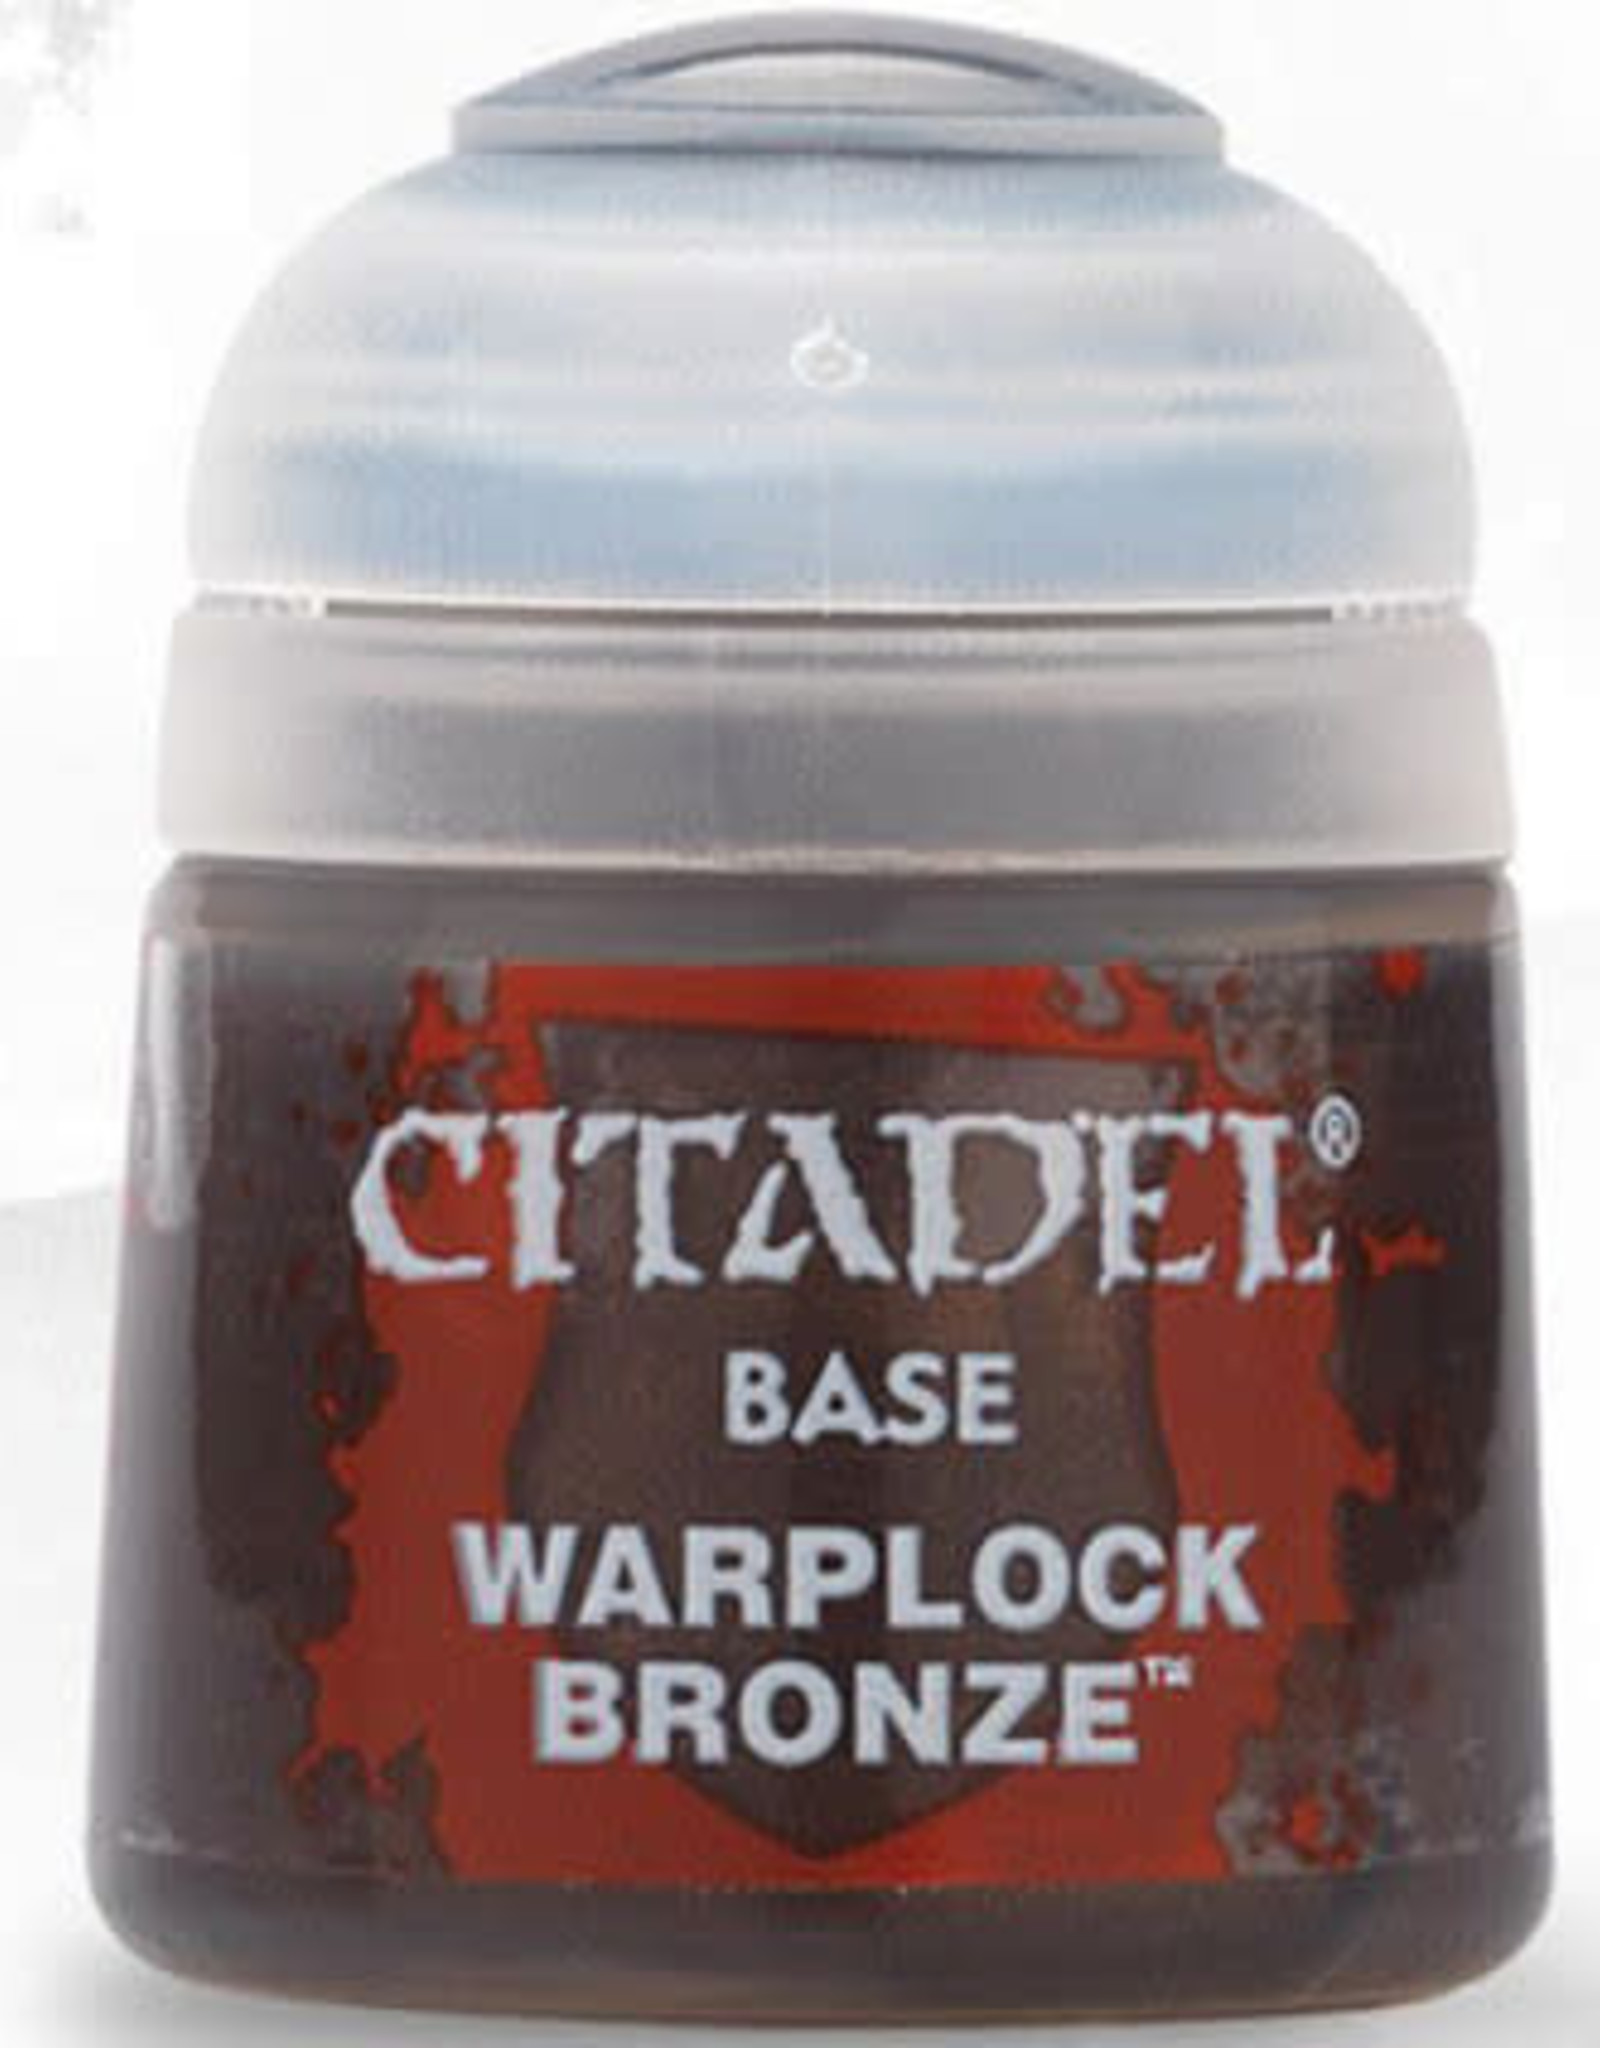 Games Workshop Citadel Paint: Base - Warplock Bronze